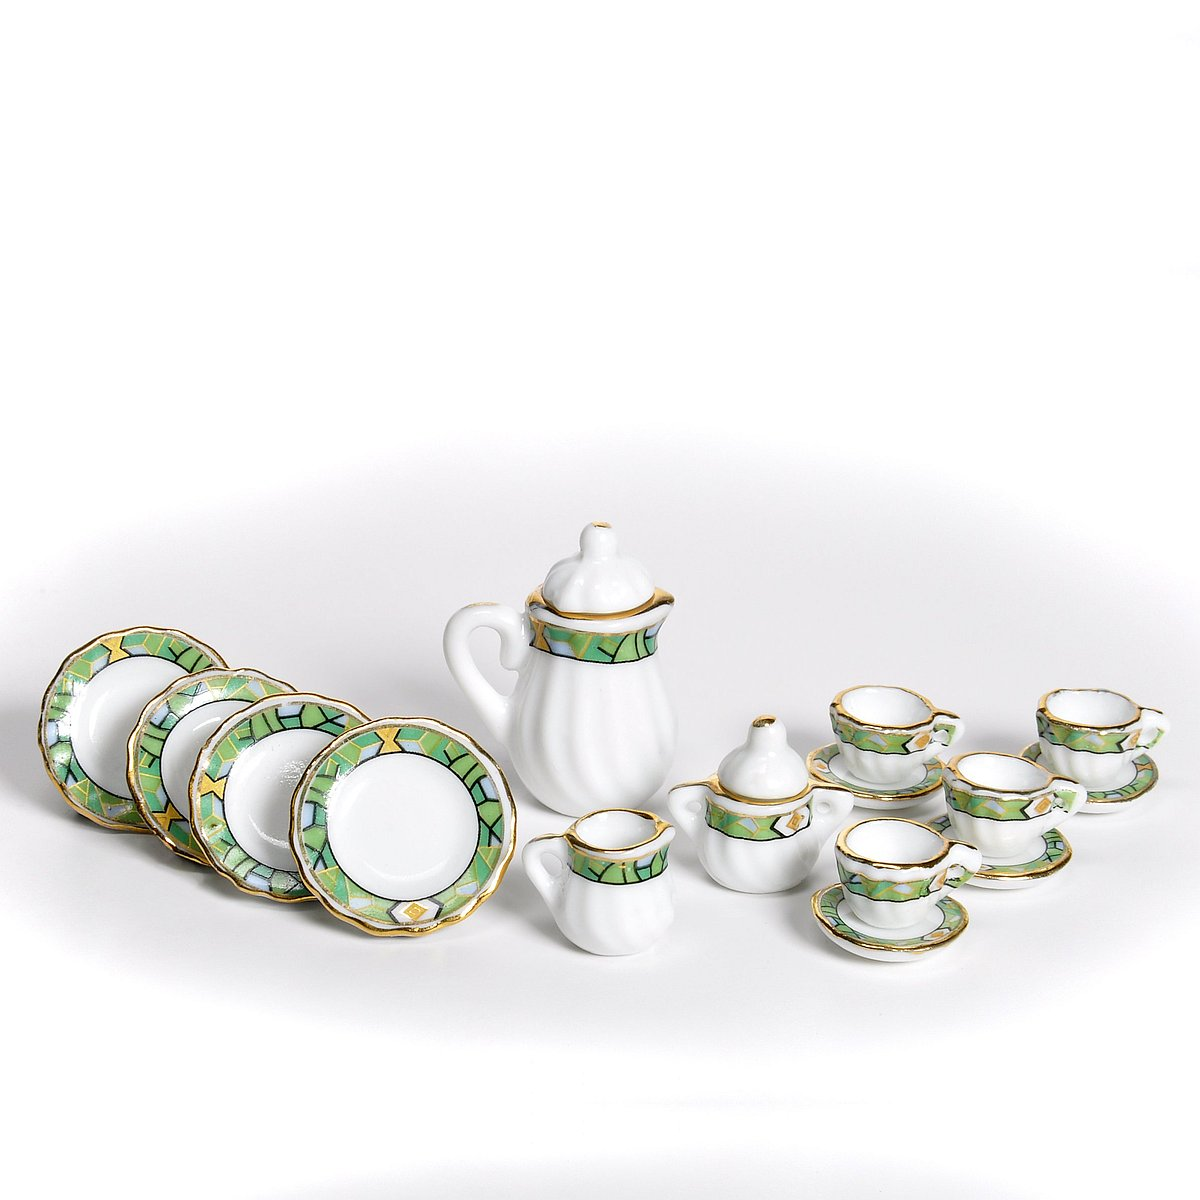 Coffee service,porcelain,  green, 15 pcs コーヒーサービス 15枚セット(グリーン)